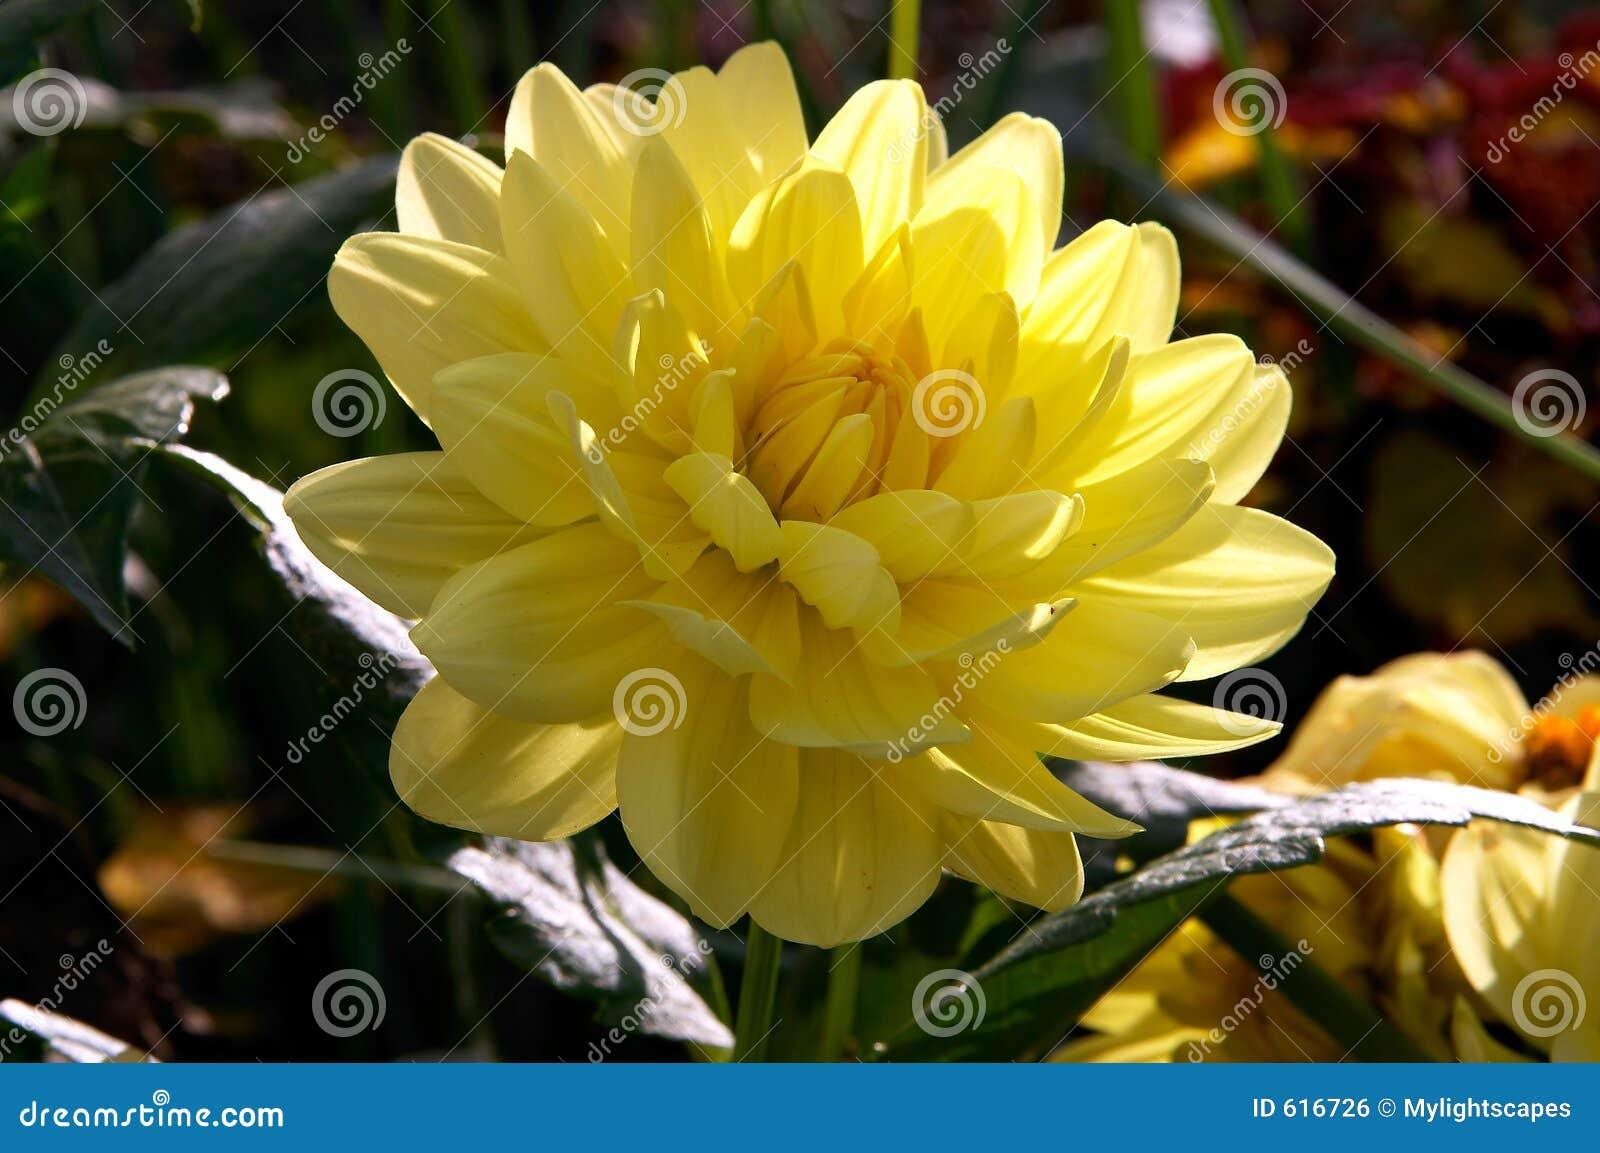 Yellow Peony Flower Stock Photo Image Of Leaf Closeup 616726